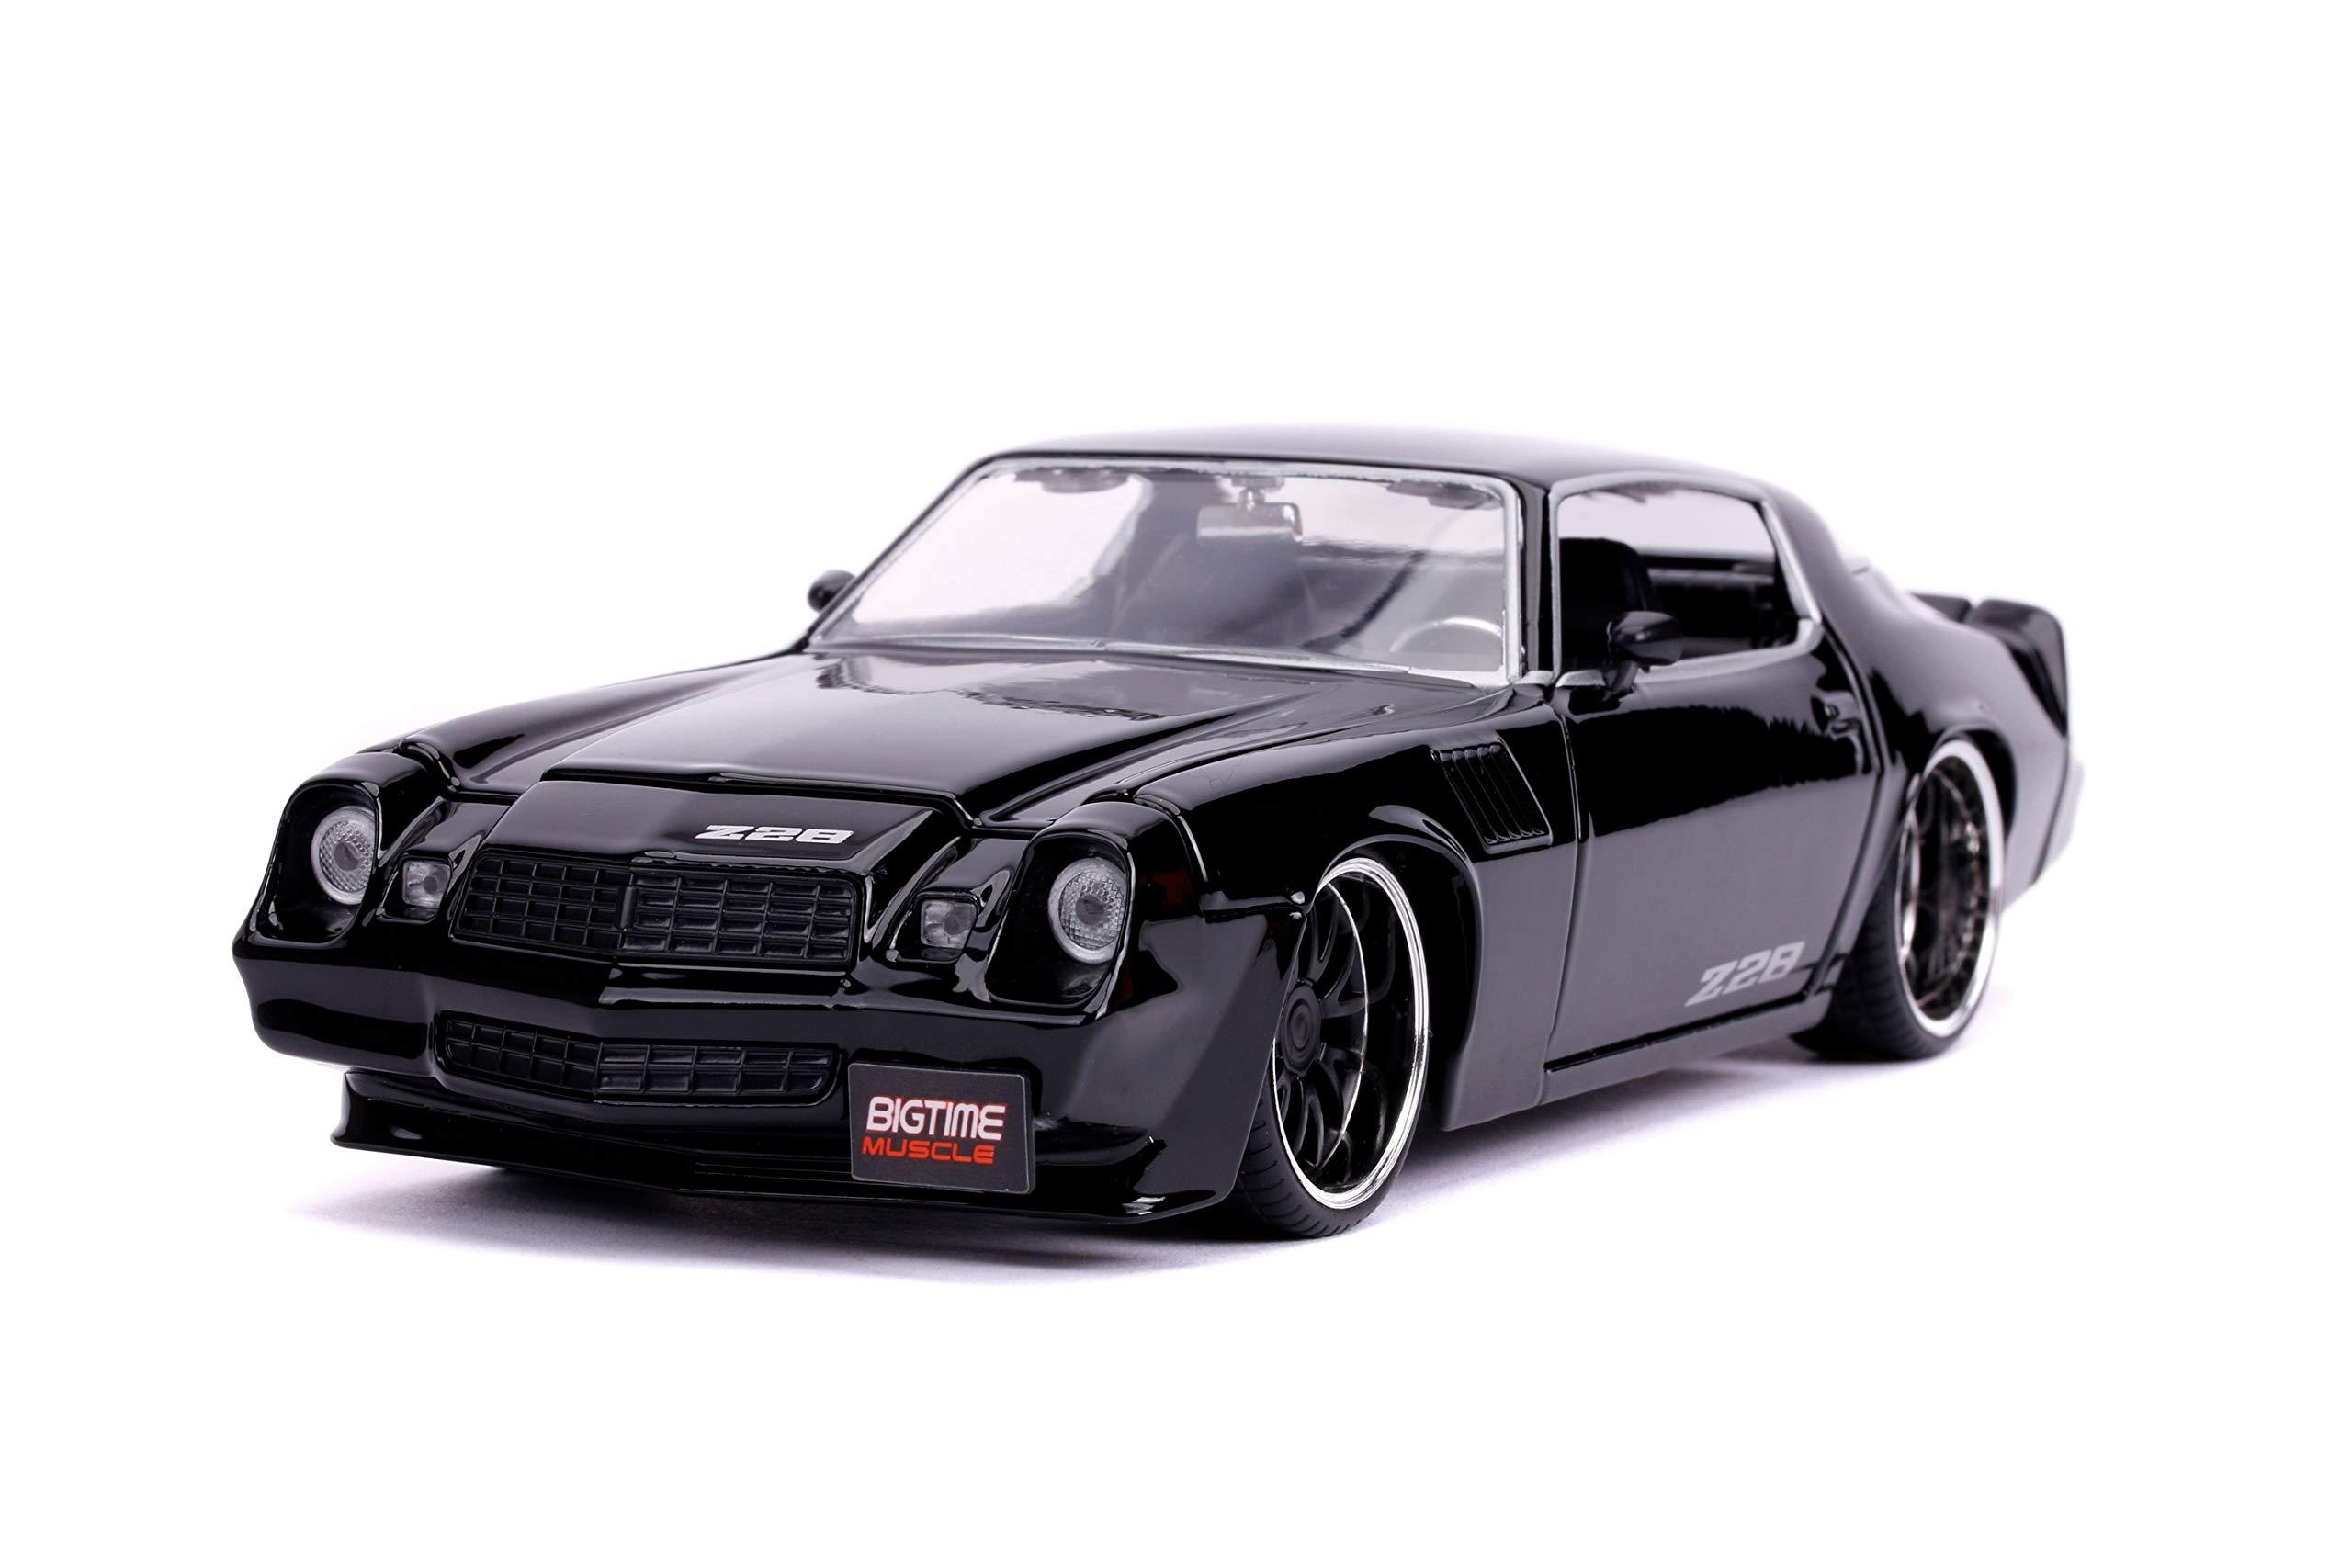 Jada TOYS 1:24 BTM - '79 Chevy Camaro Z28